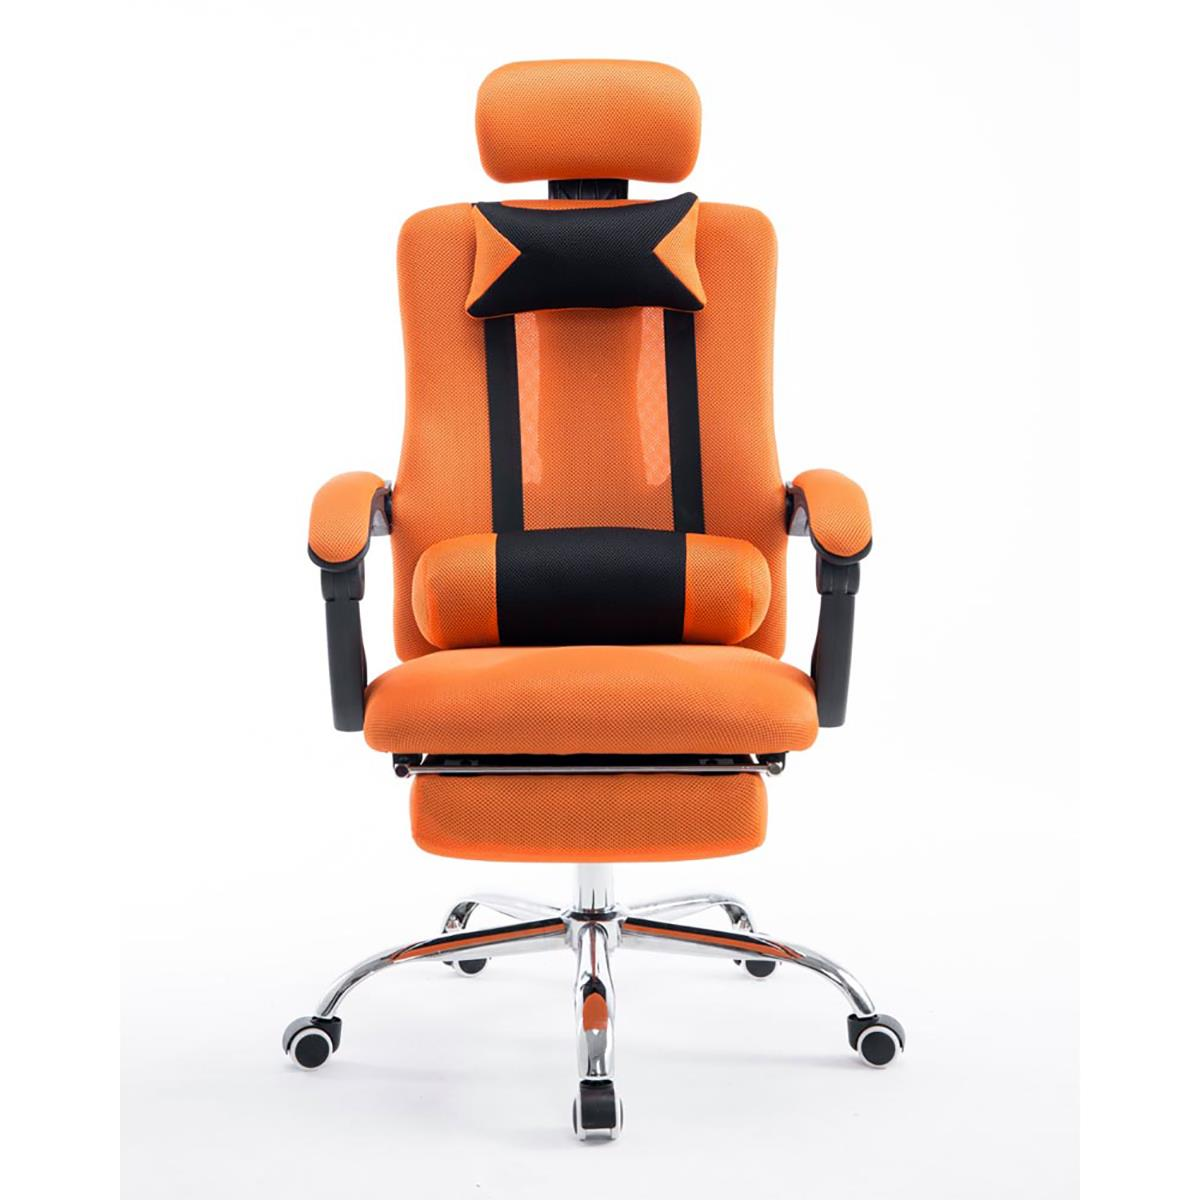 Silla de oficina antares reclinable en varias posiciones for Silla oficina gaming